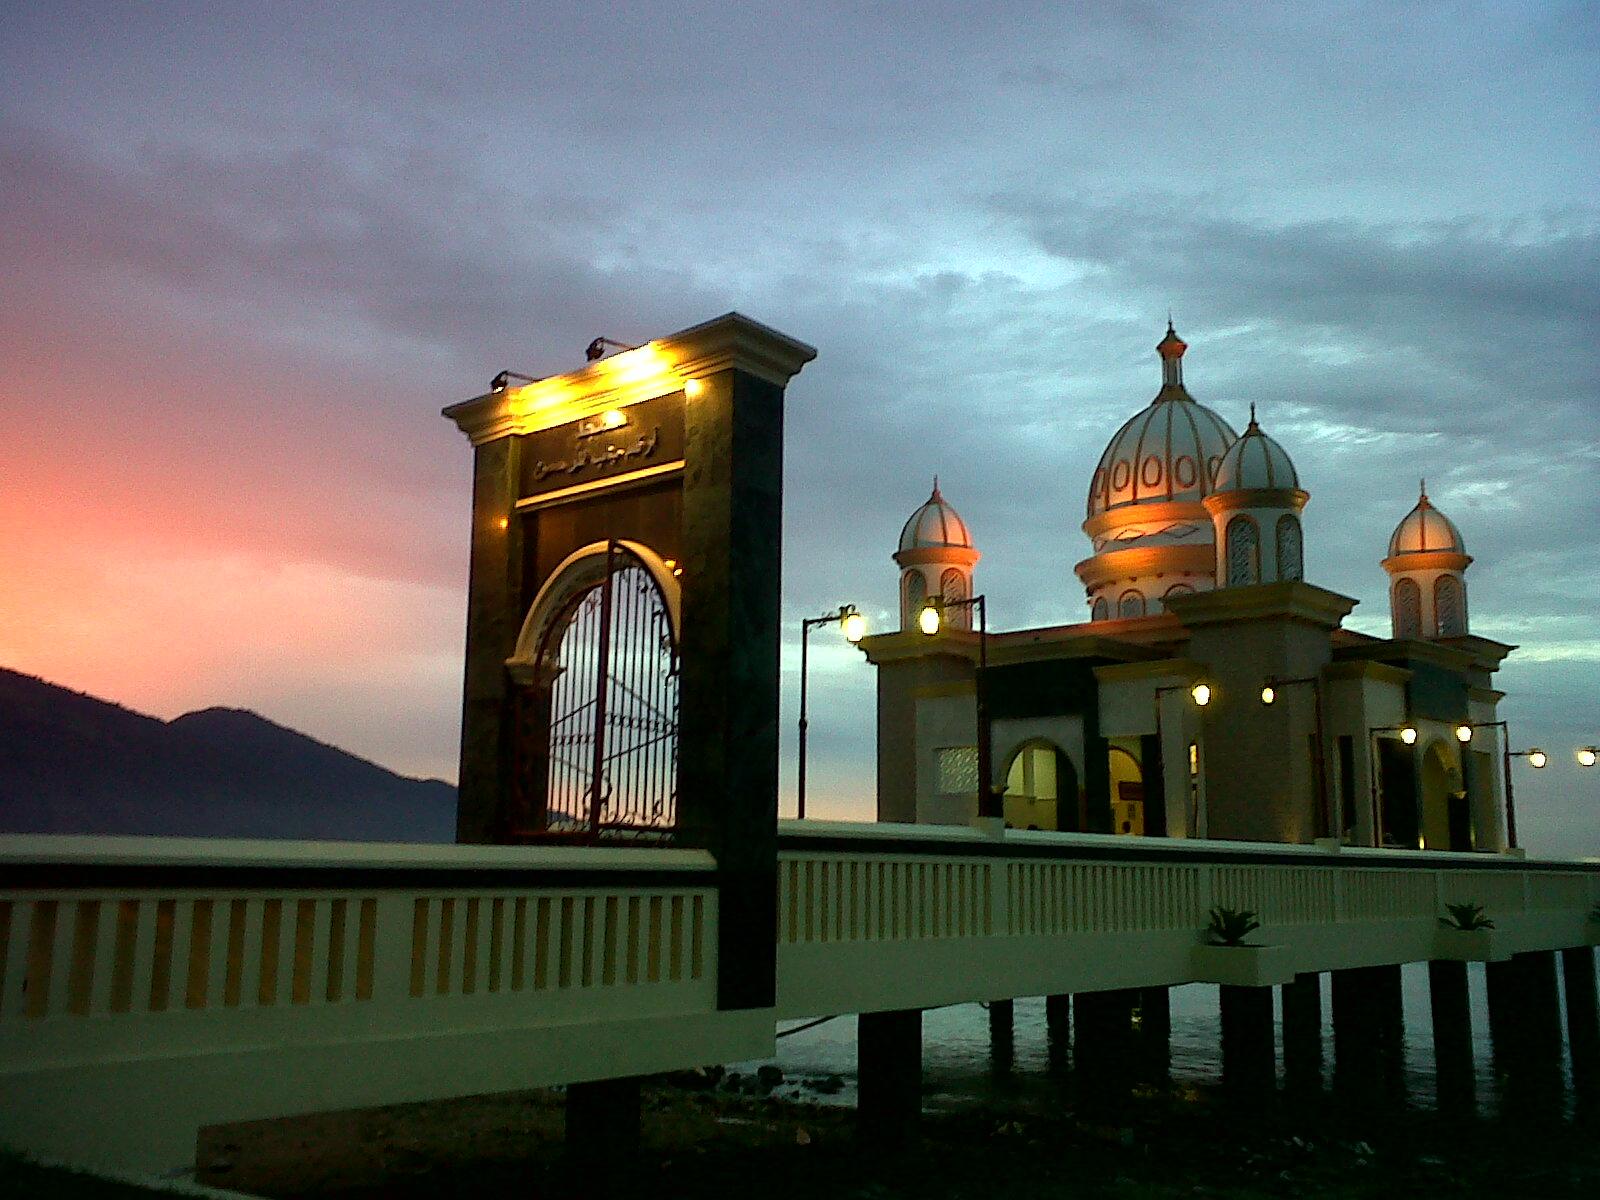 Kota Palu Bawang Goreng Dimisril Maaf Temans Sebenarnya Kuceritakan Tapi